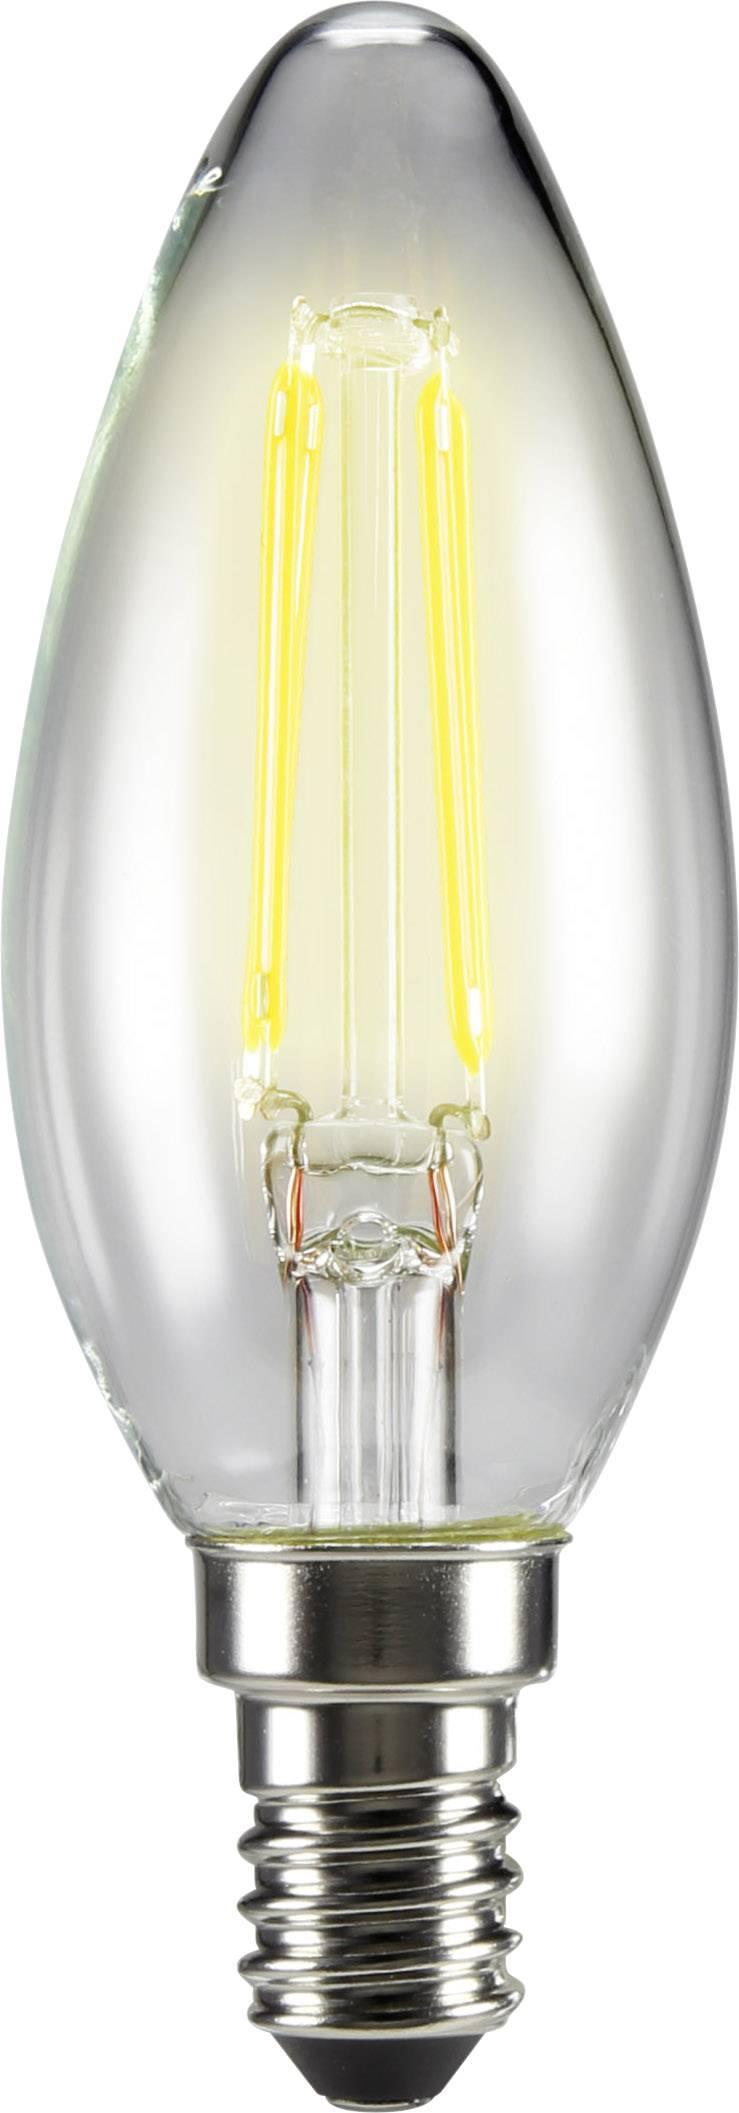 LED žiarovka 99 mm sygonix 230 V 4 W = 40 W vlákno 1 ks